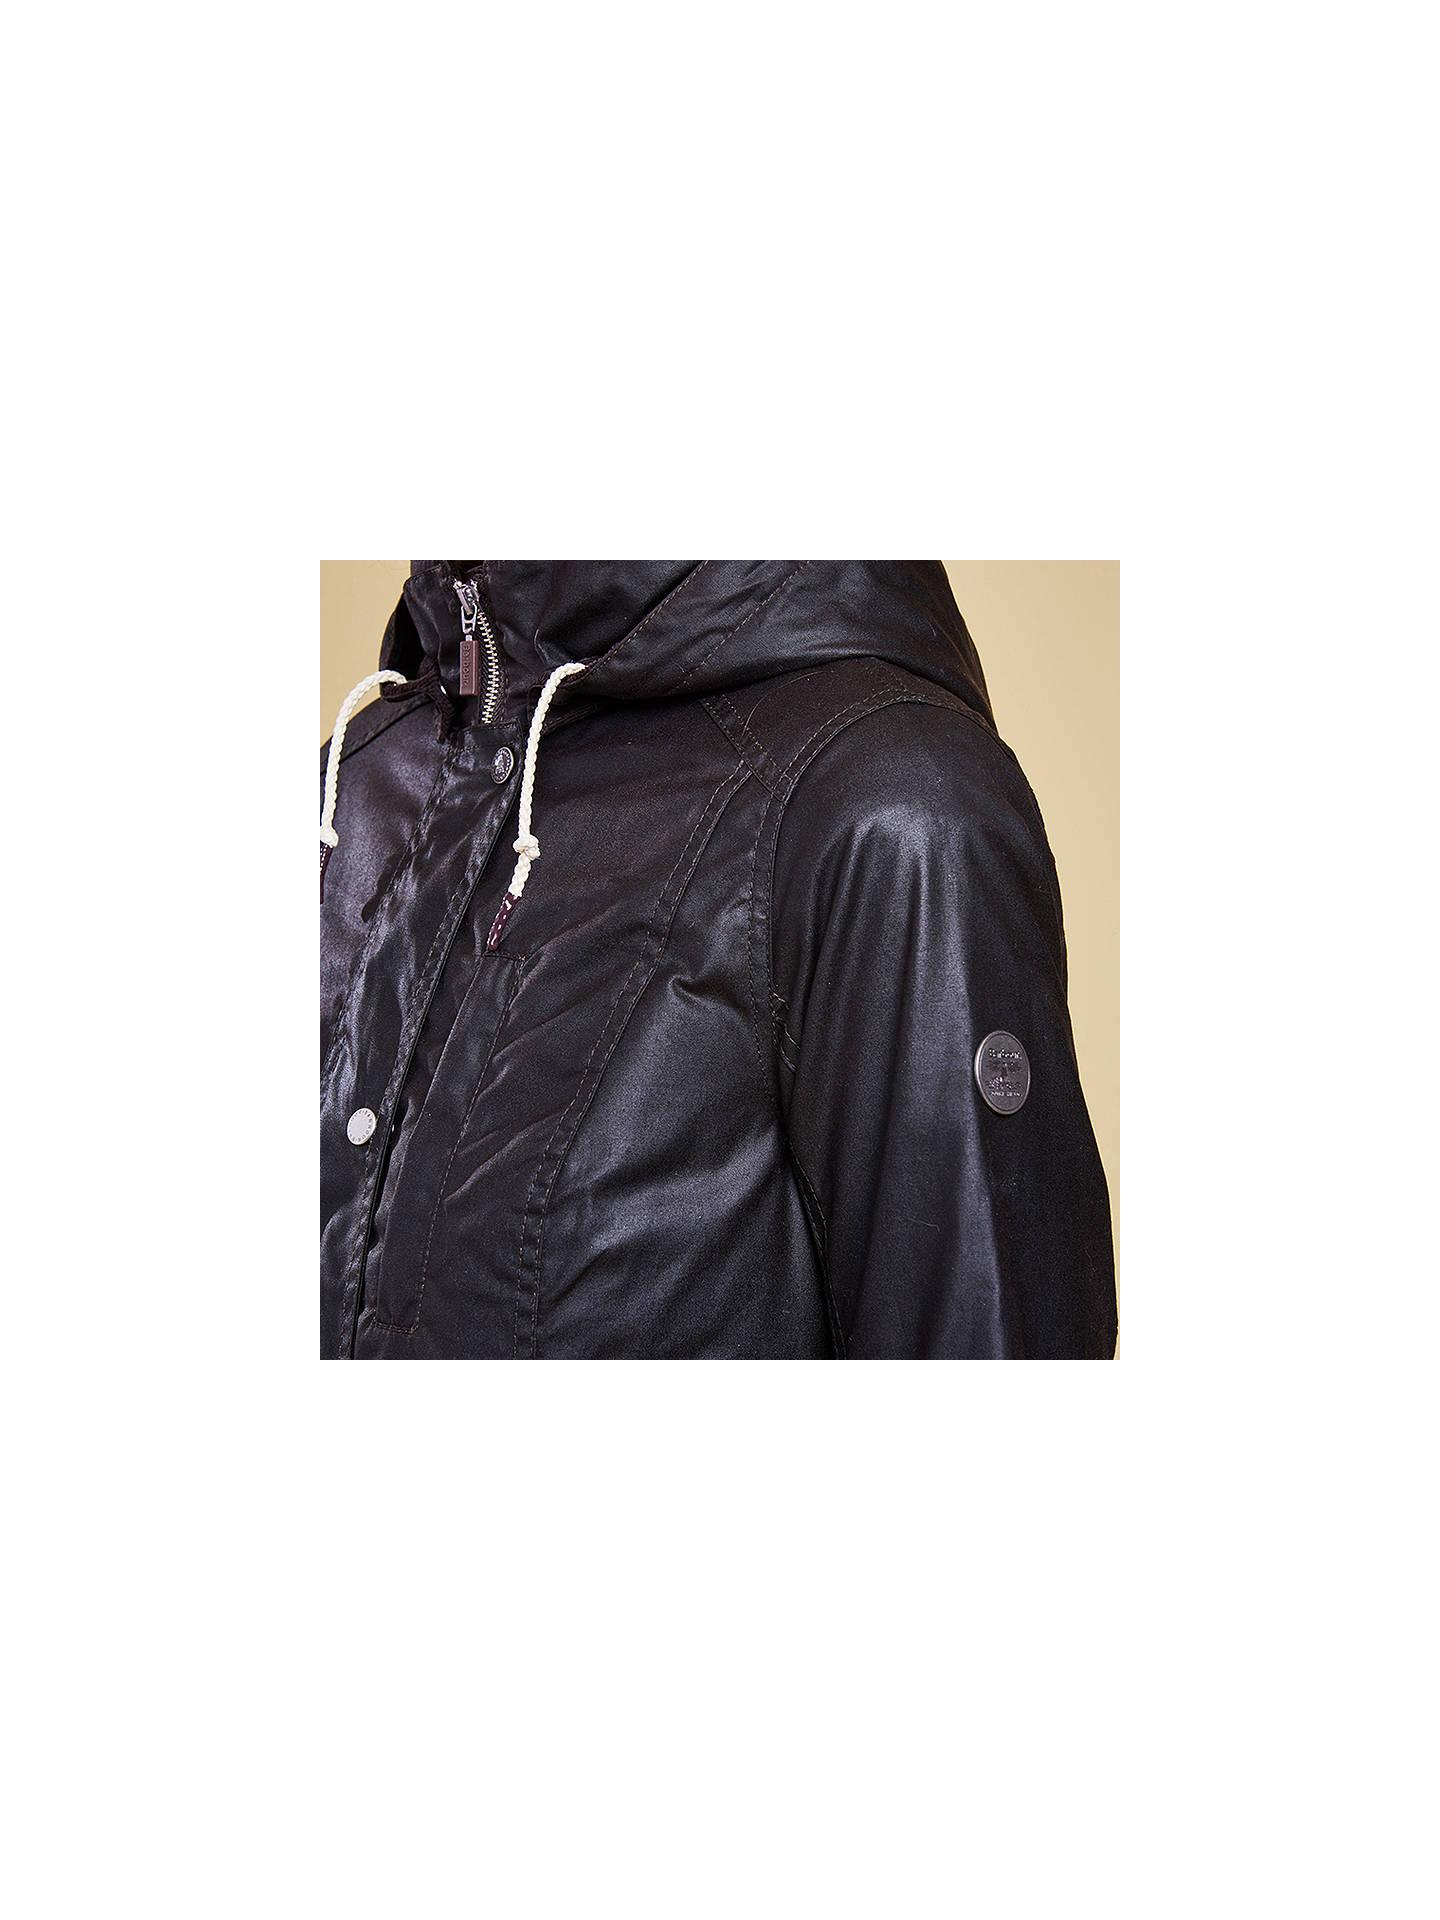 b148fd76a Barbour Kelp Waxed Jacket at John Lewis & Partners